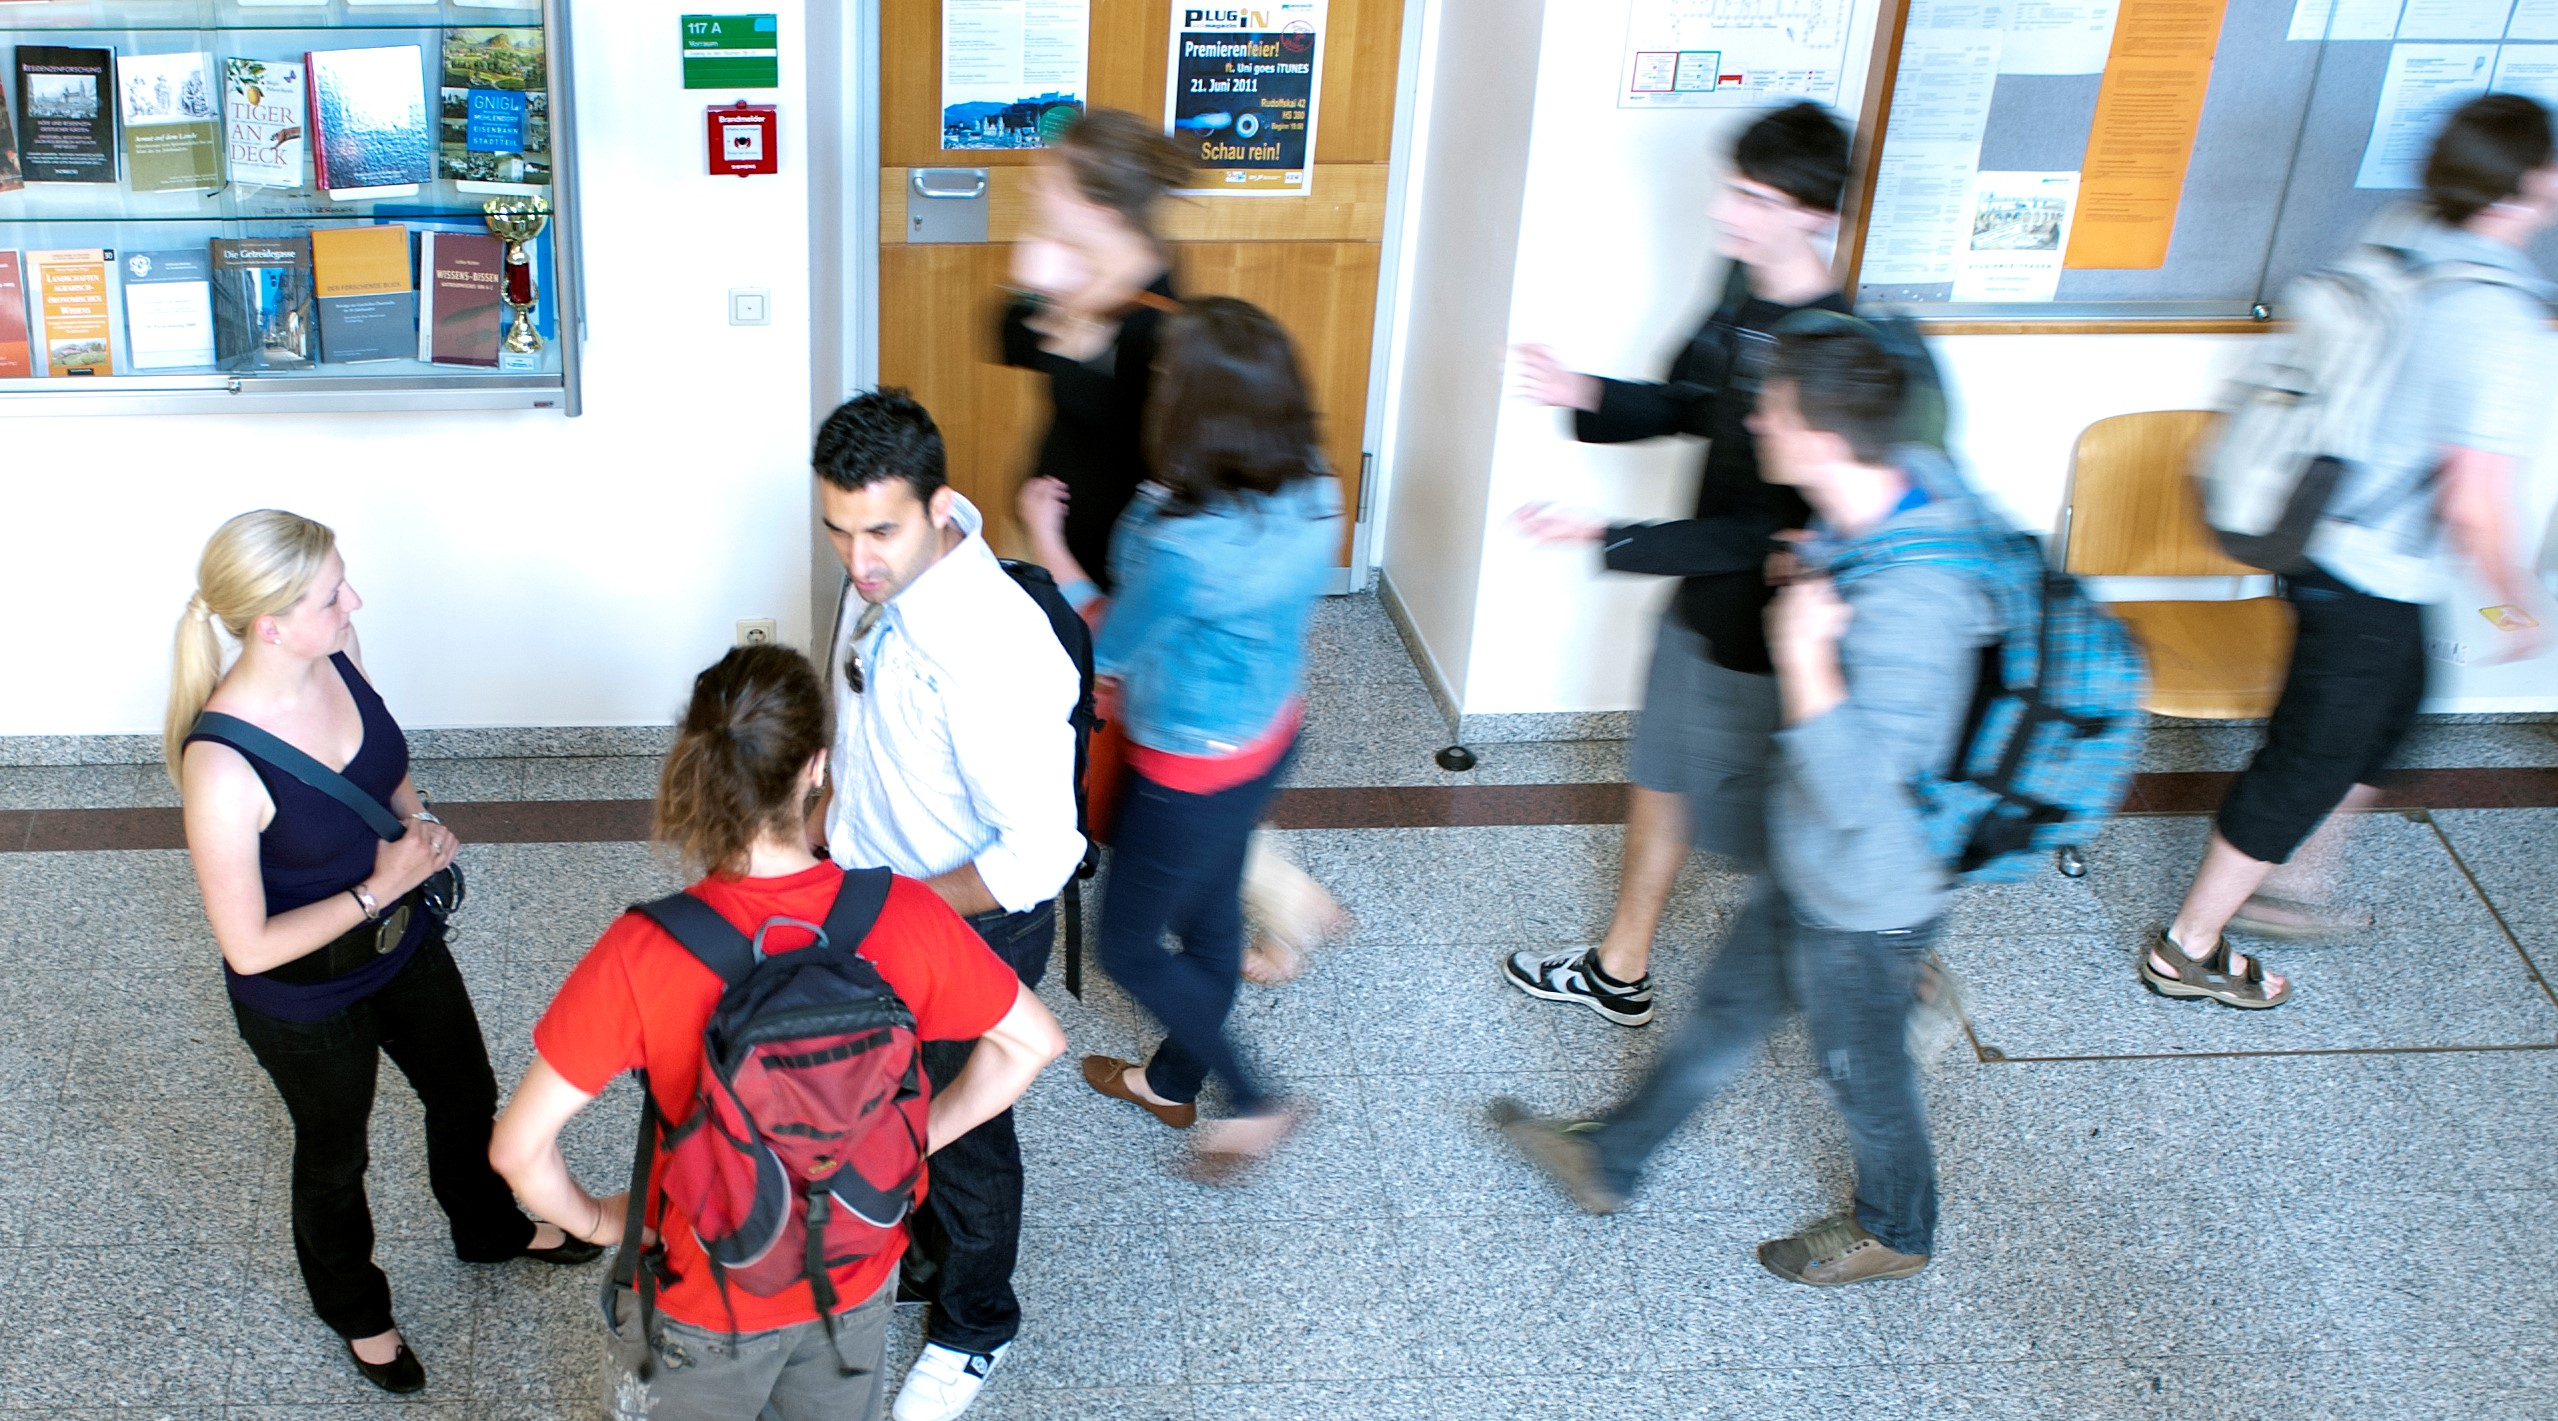 Studierende, Gang, Rudolfskai